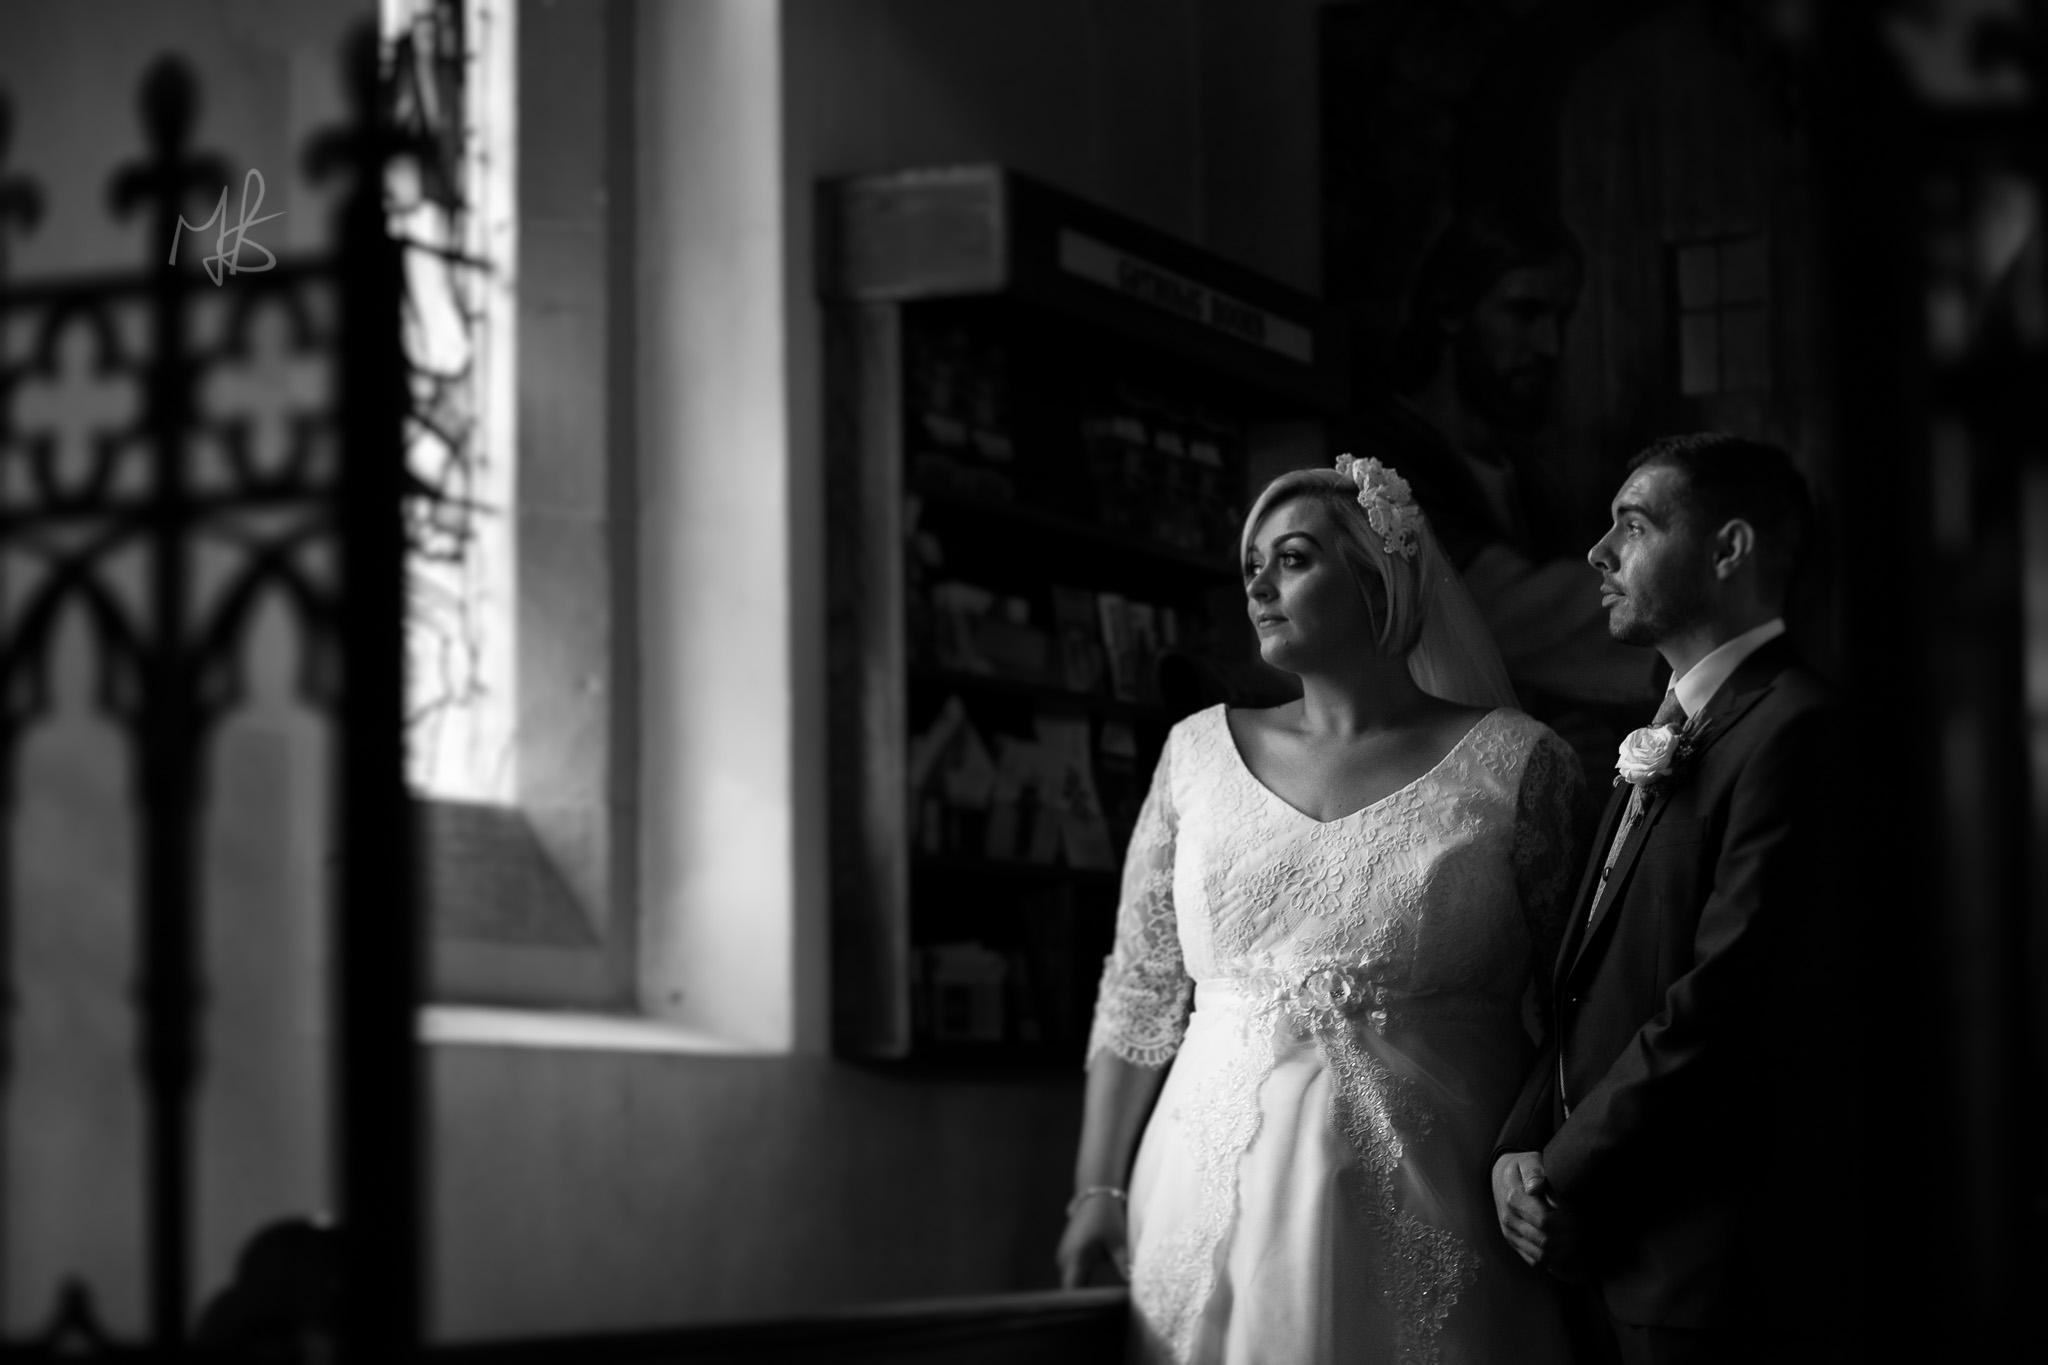 Northern-Ireland-Wedding-Photographer-Mark-Barnes-Ballymena_wedding-photography-Leighinmohr-House-Seamas_Alanna_For-web-25.jpg